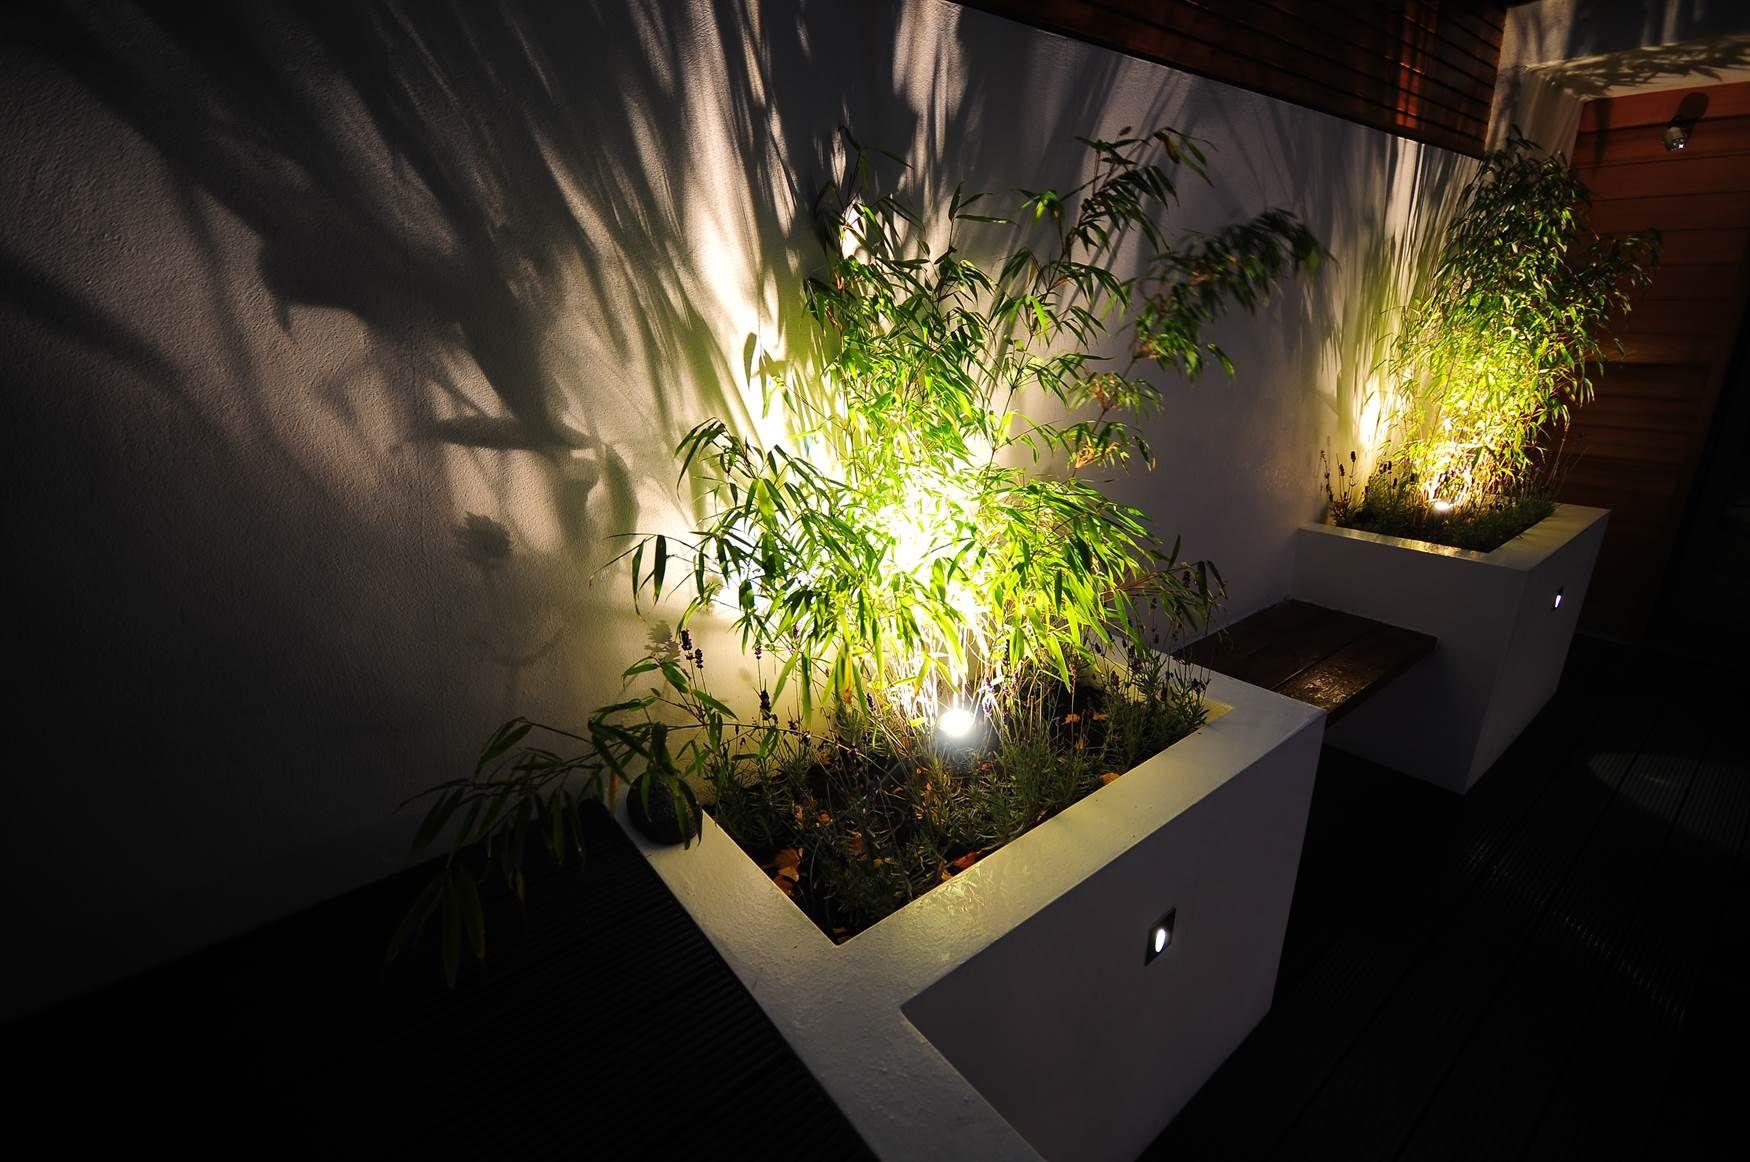 Garden lighting design by Mr Resistor. Uplighting plants ...